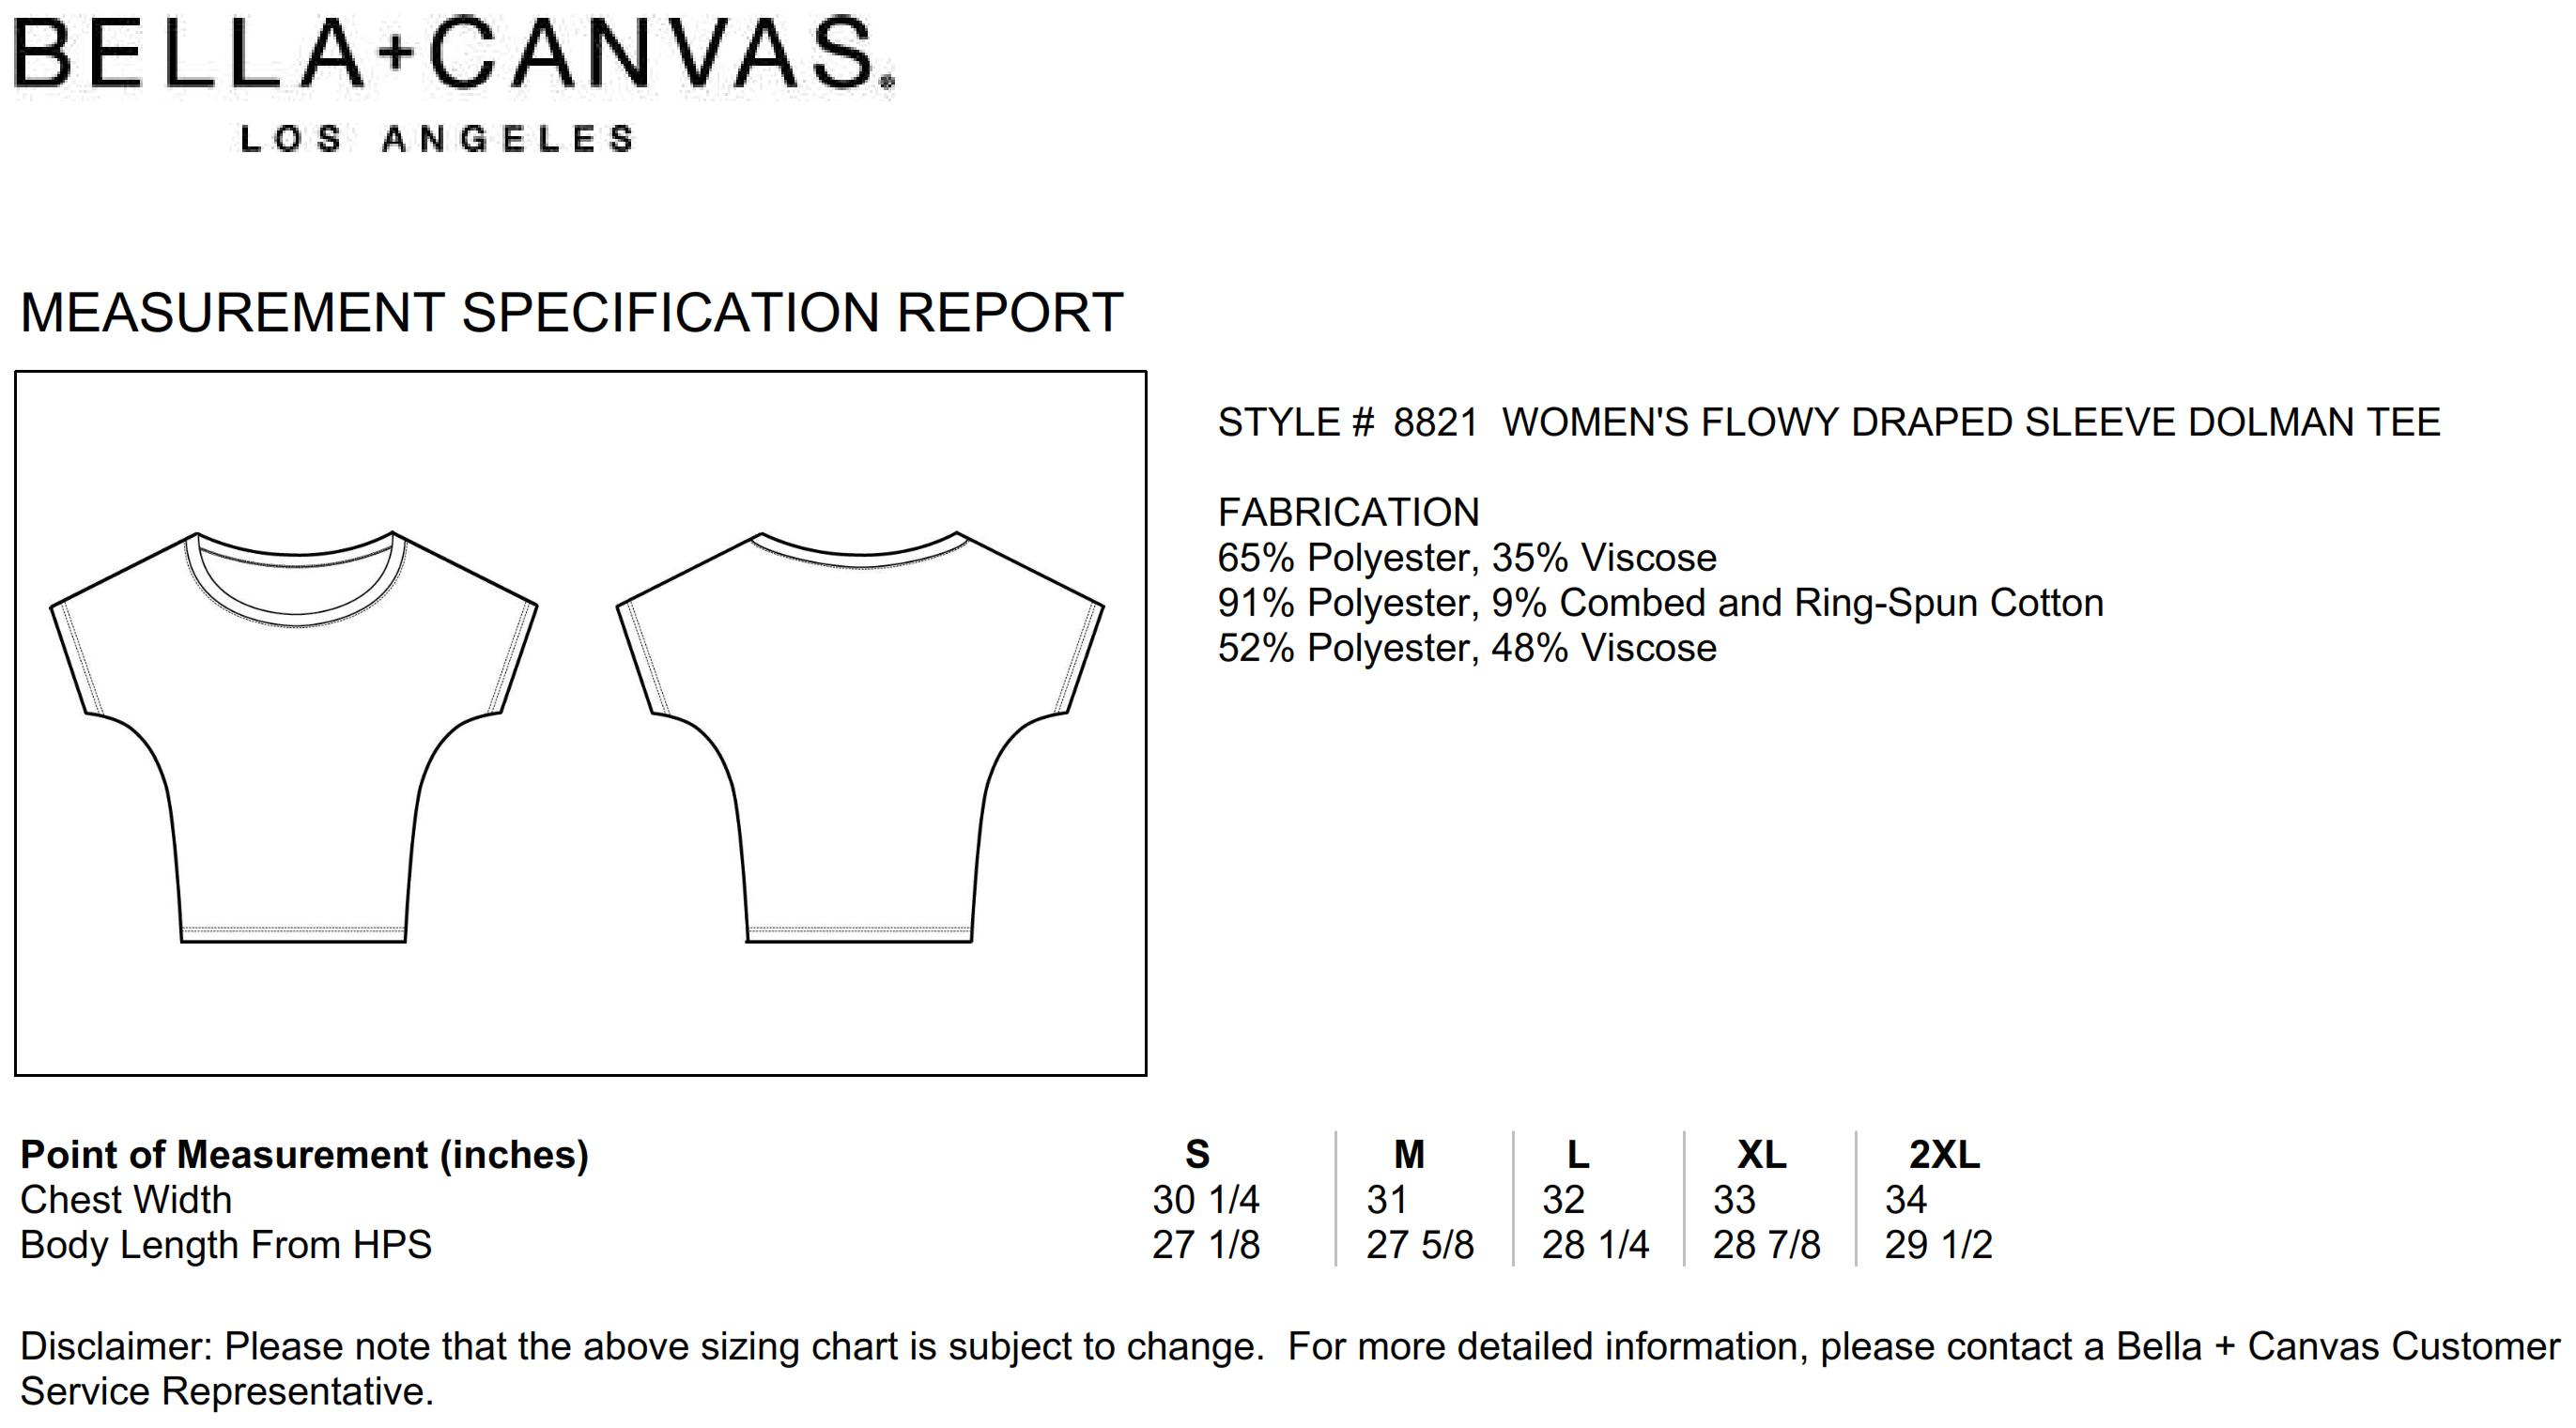 Bella+Canvas: Flowy Draped Sleeve Dolman T-Shirt 8821